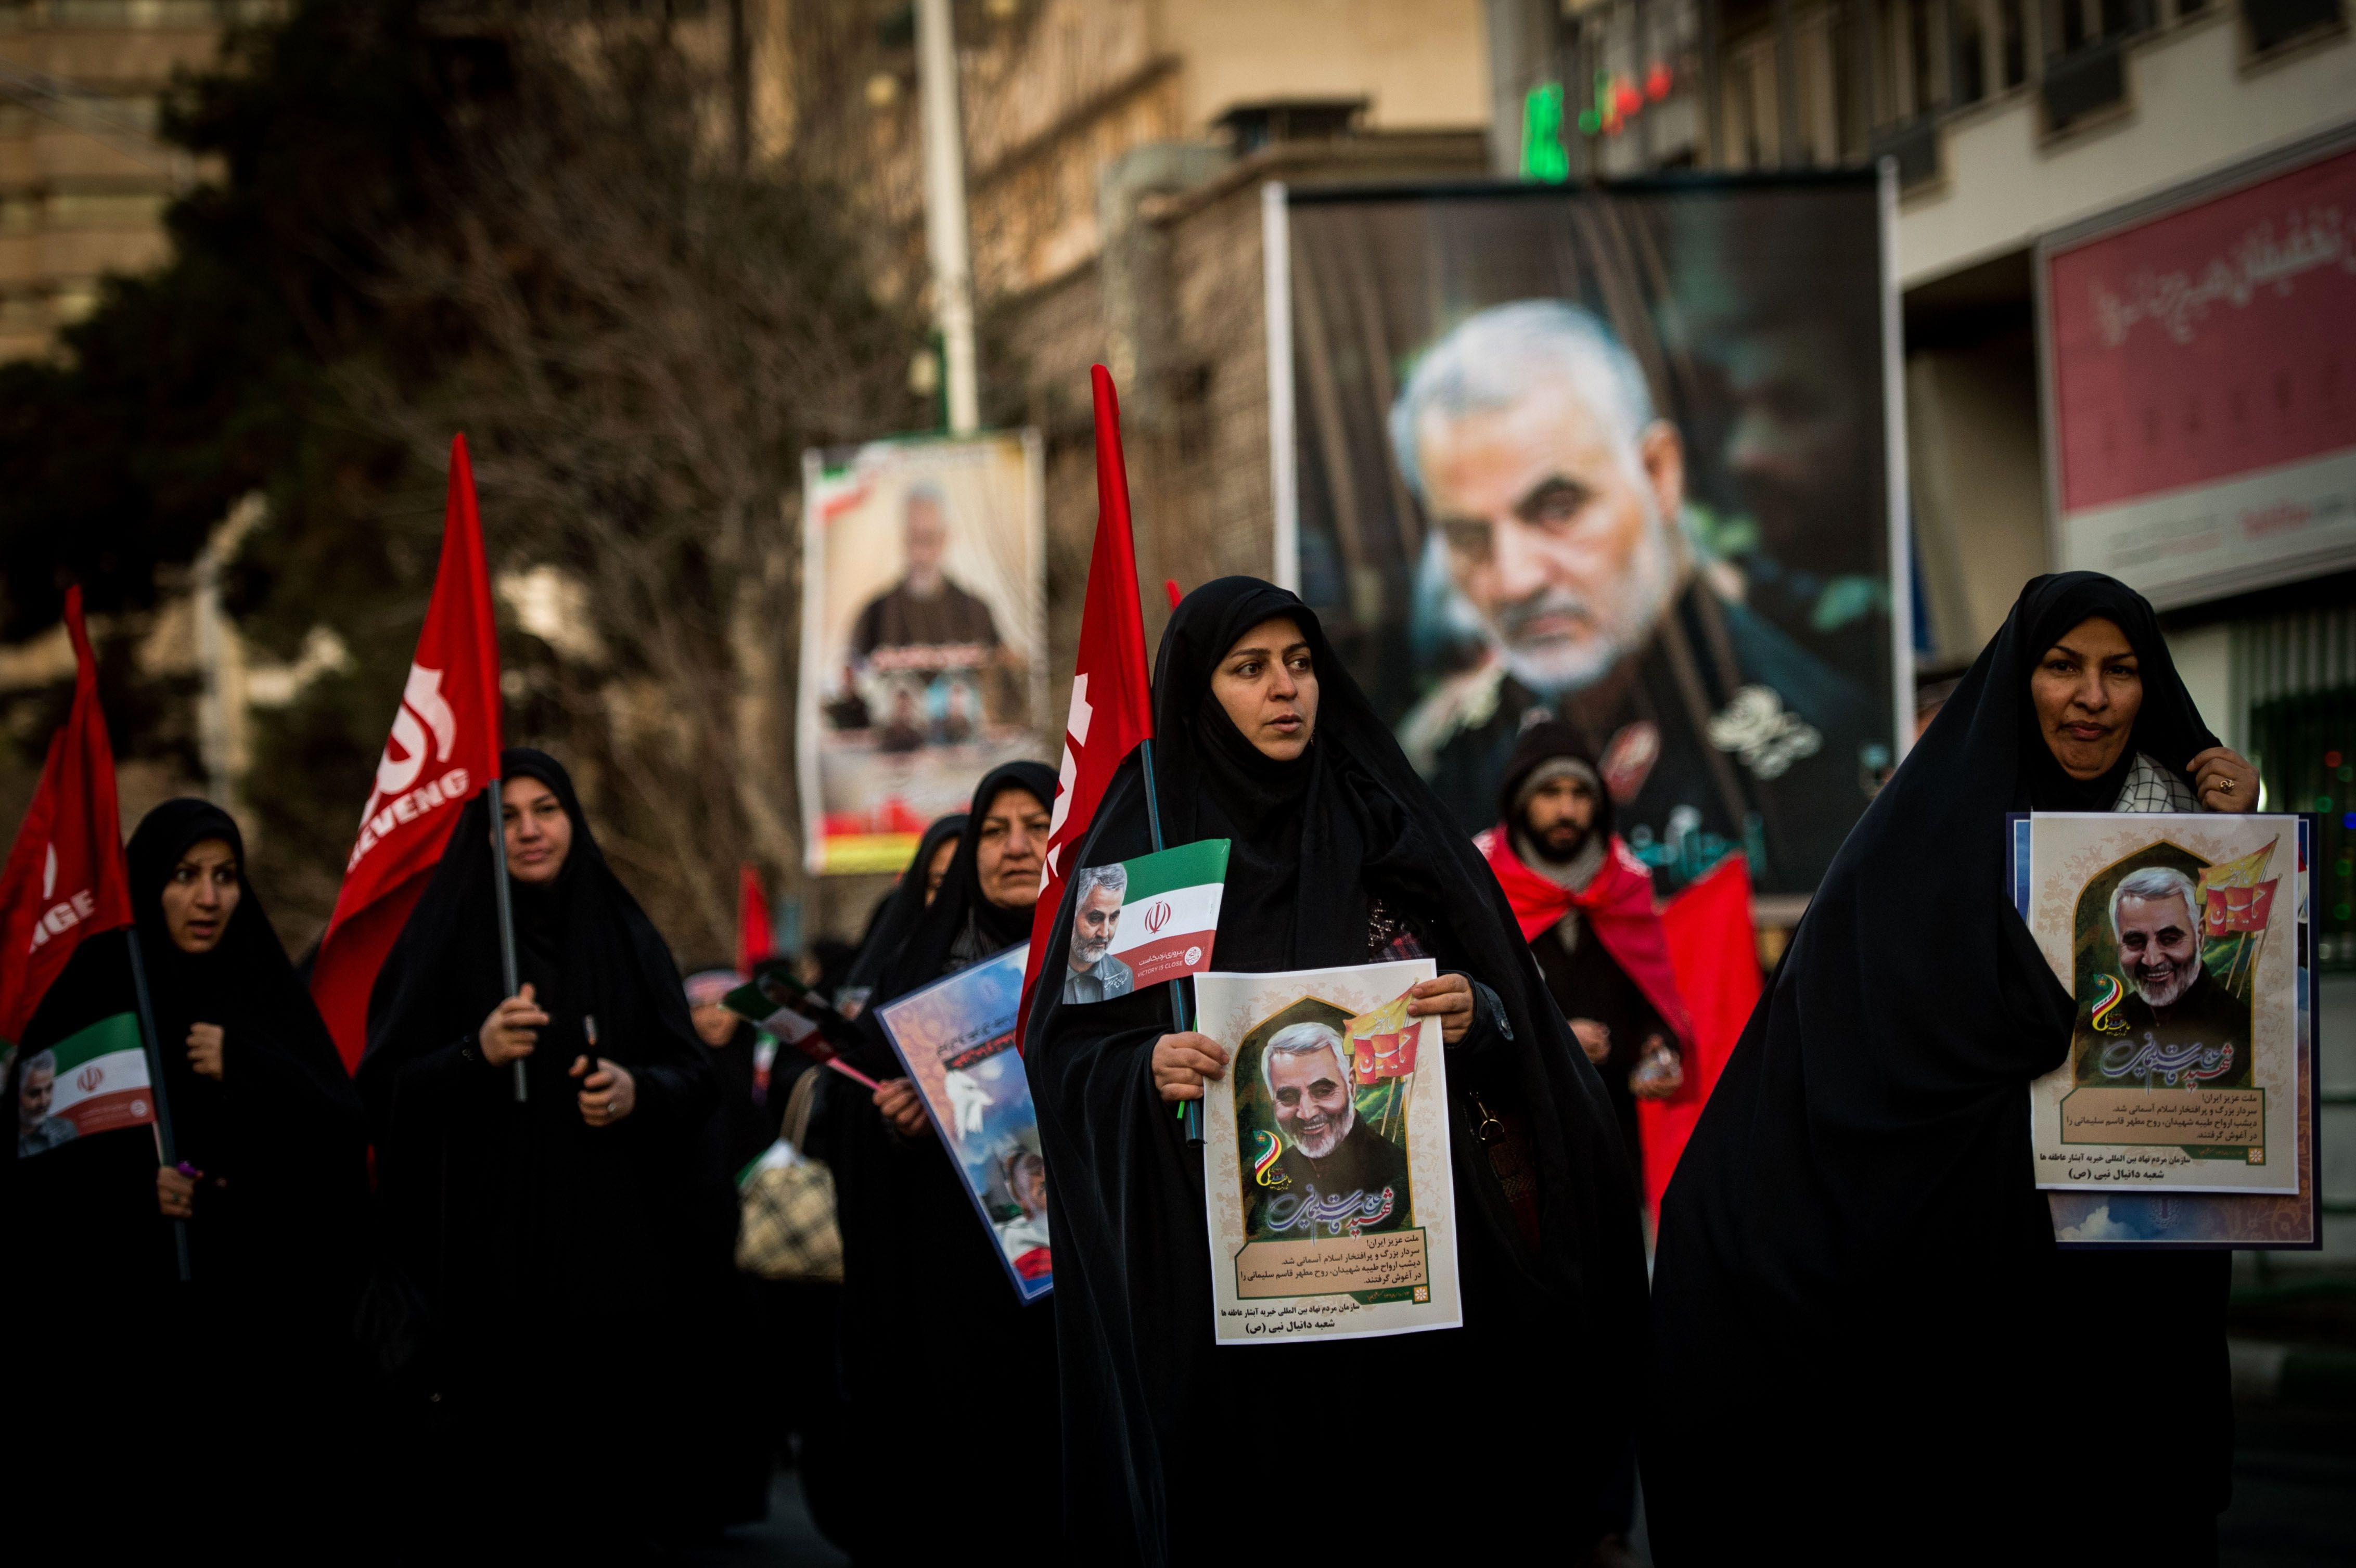 Saudi Arabia Says 'Very Keen' to Avoid Regional Escalation